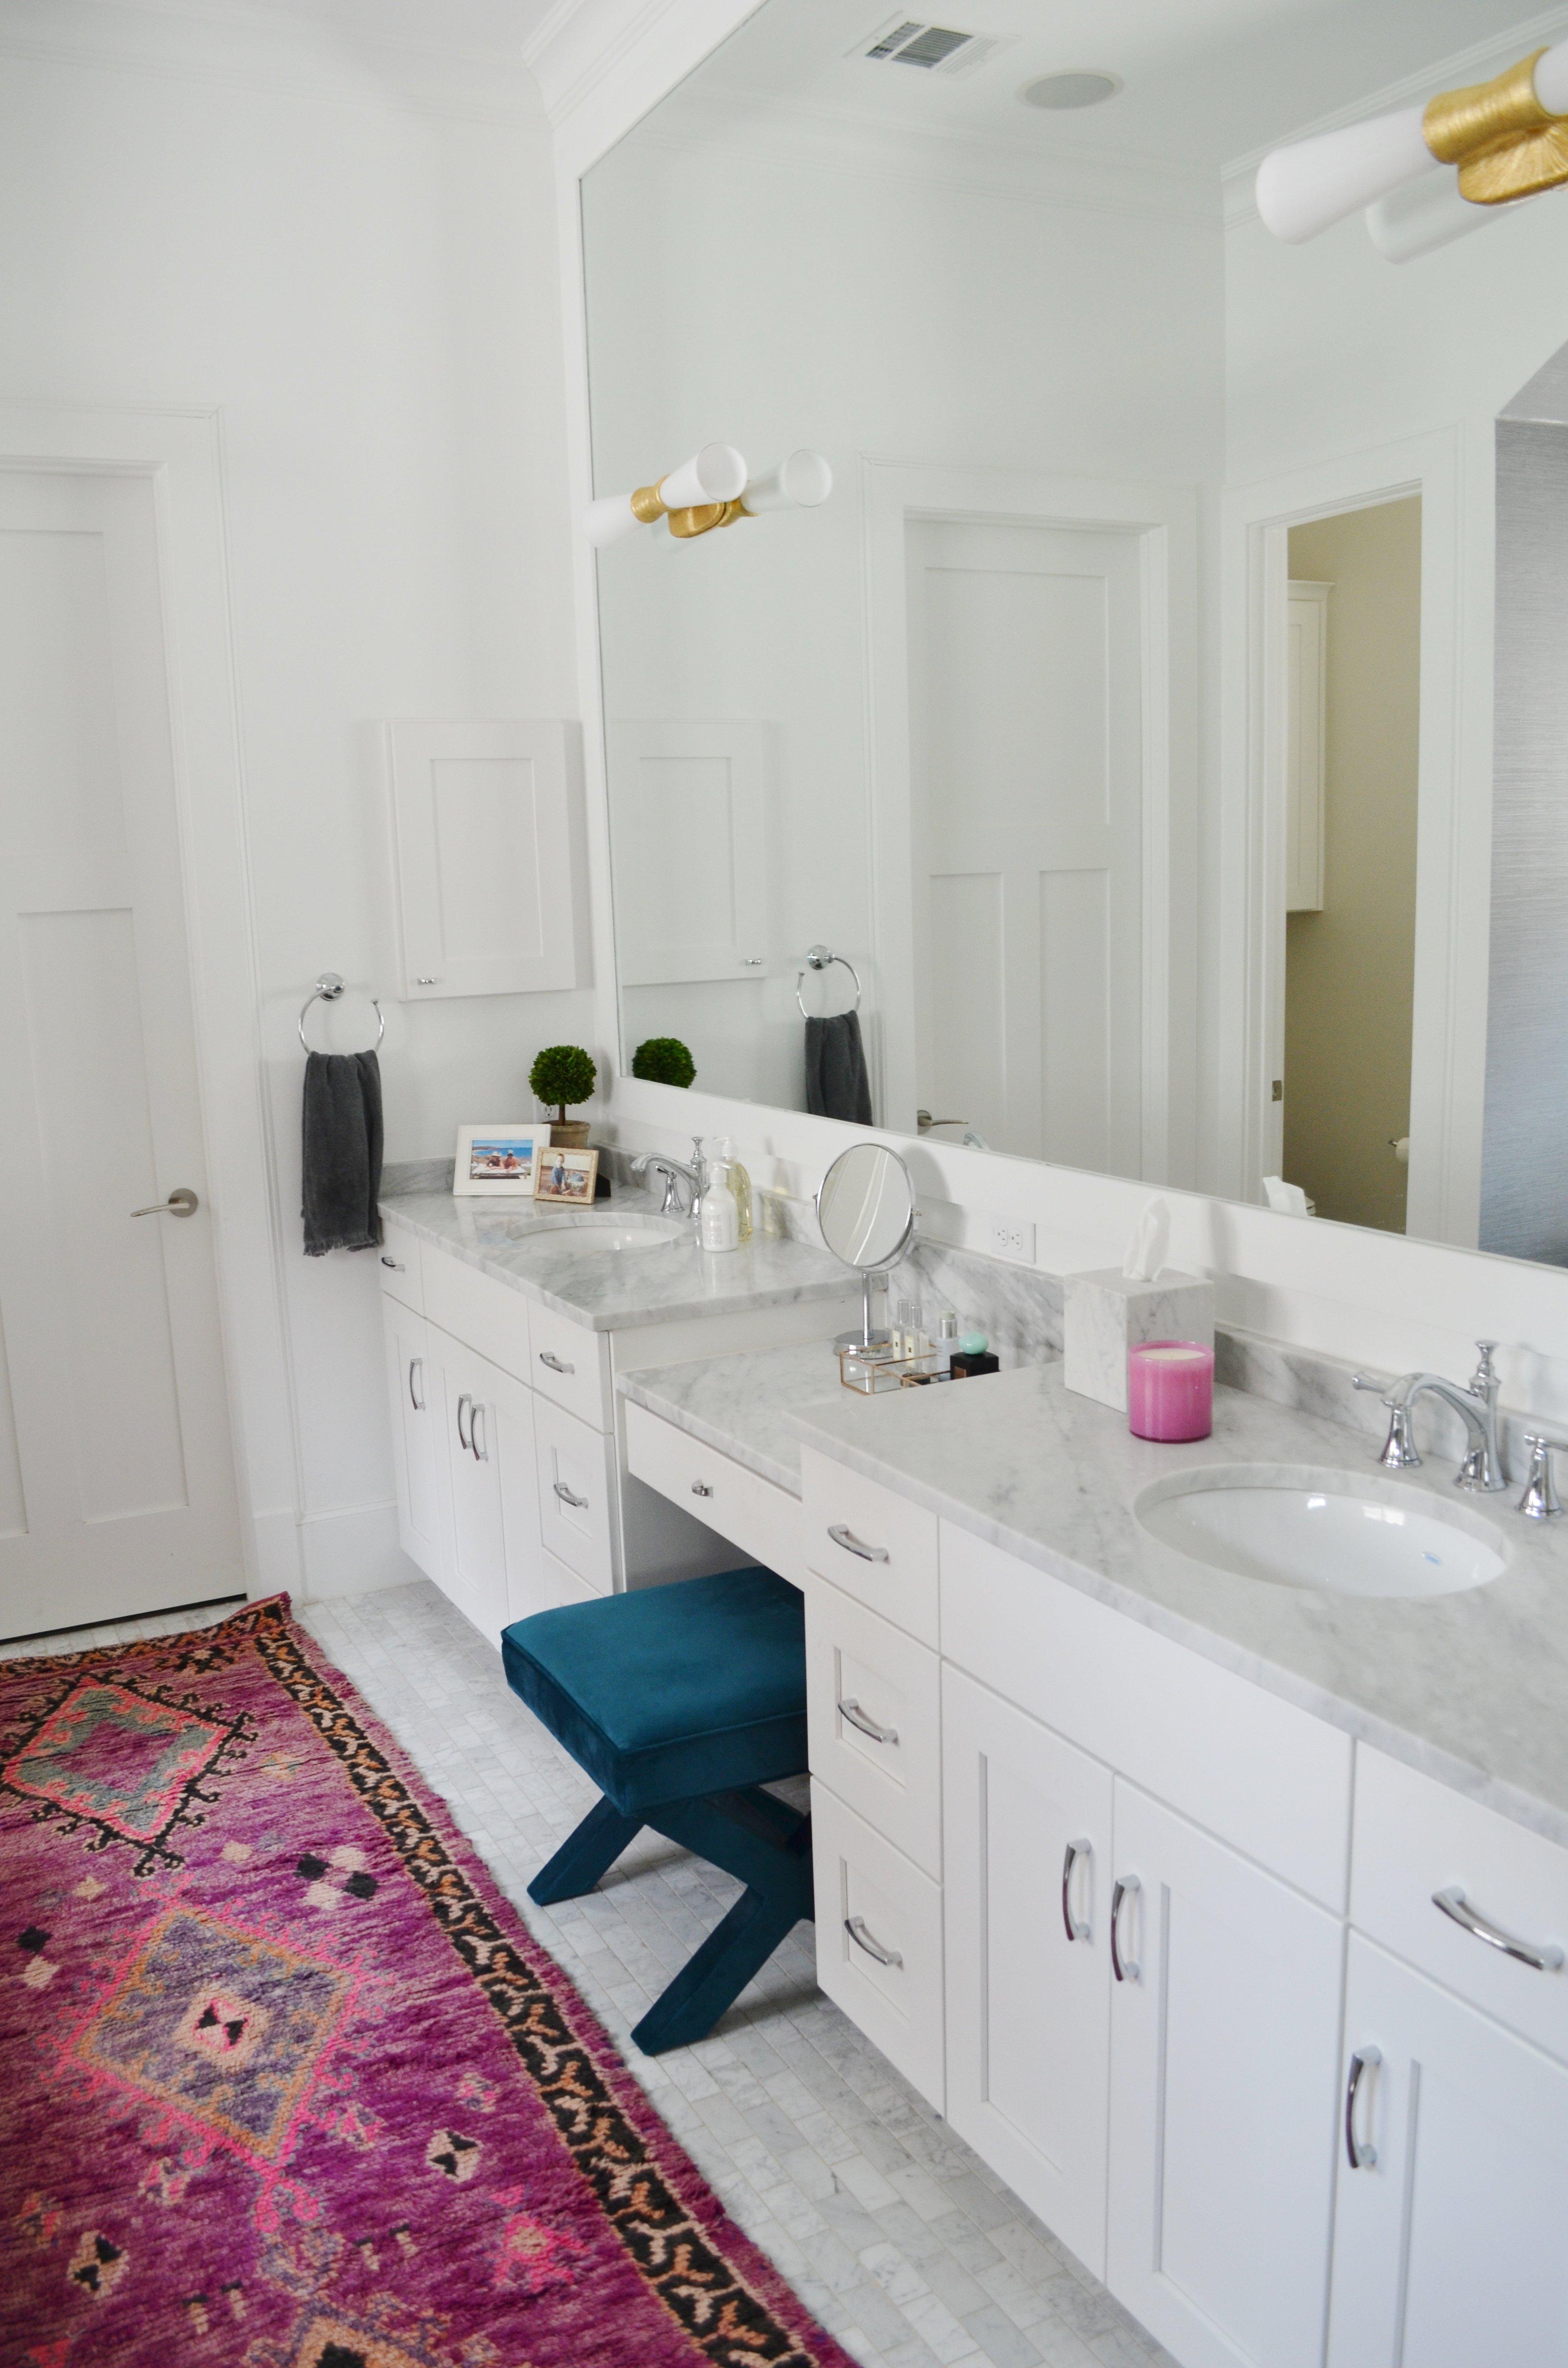 Before & After: Master Bath Refresh - Heather Scott Home & Design